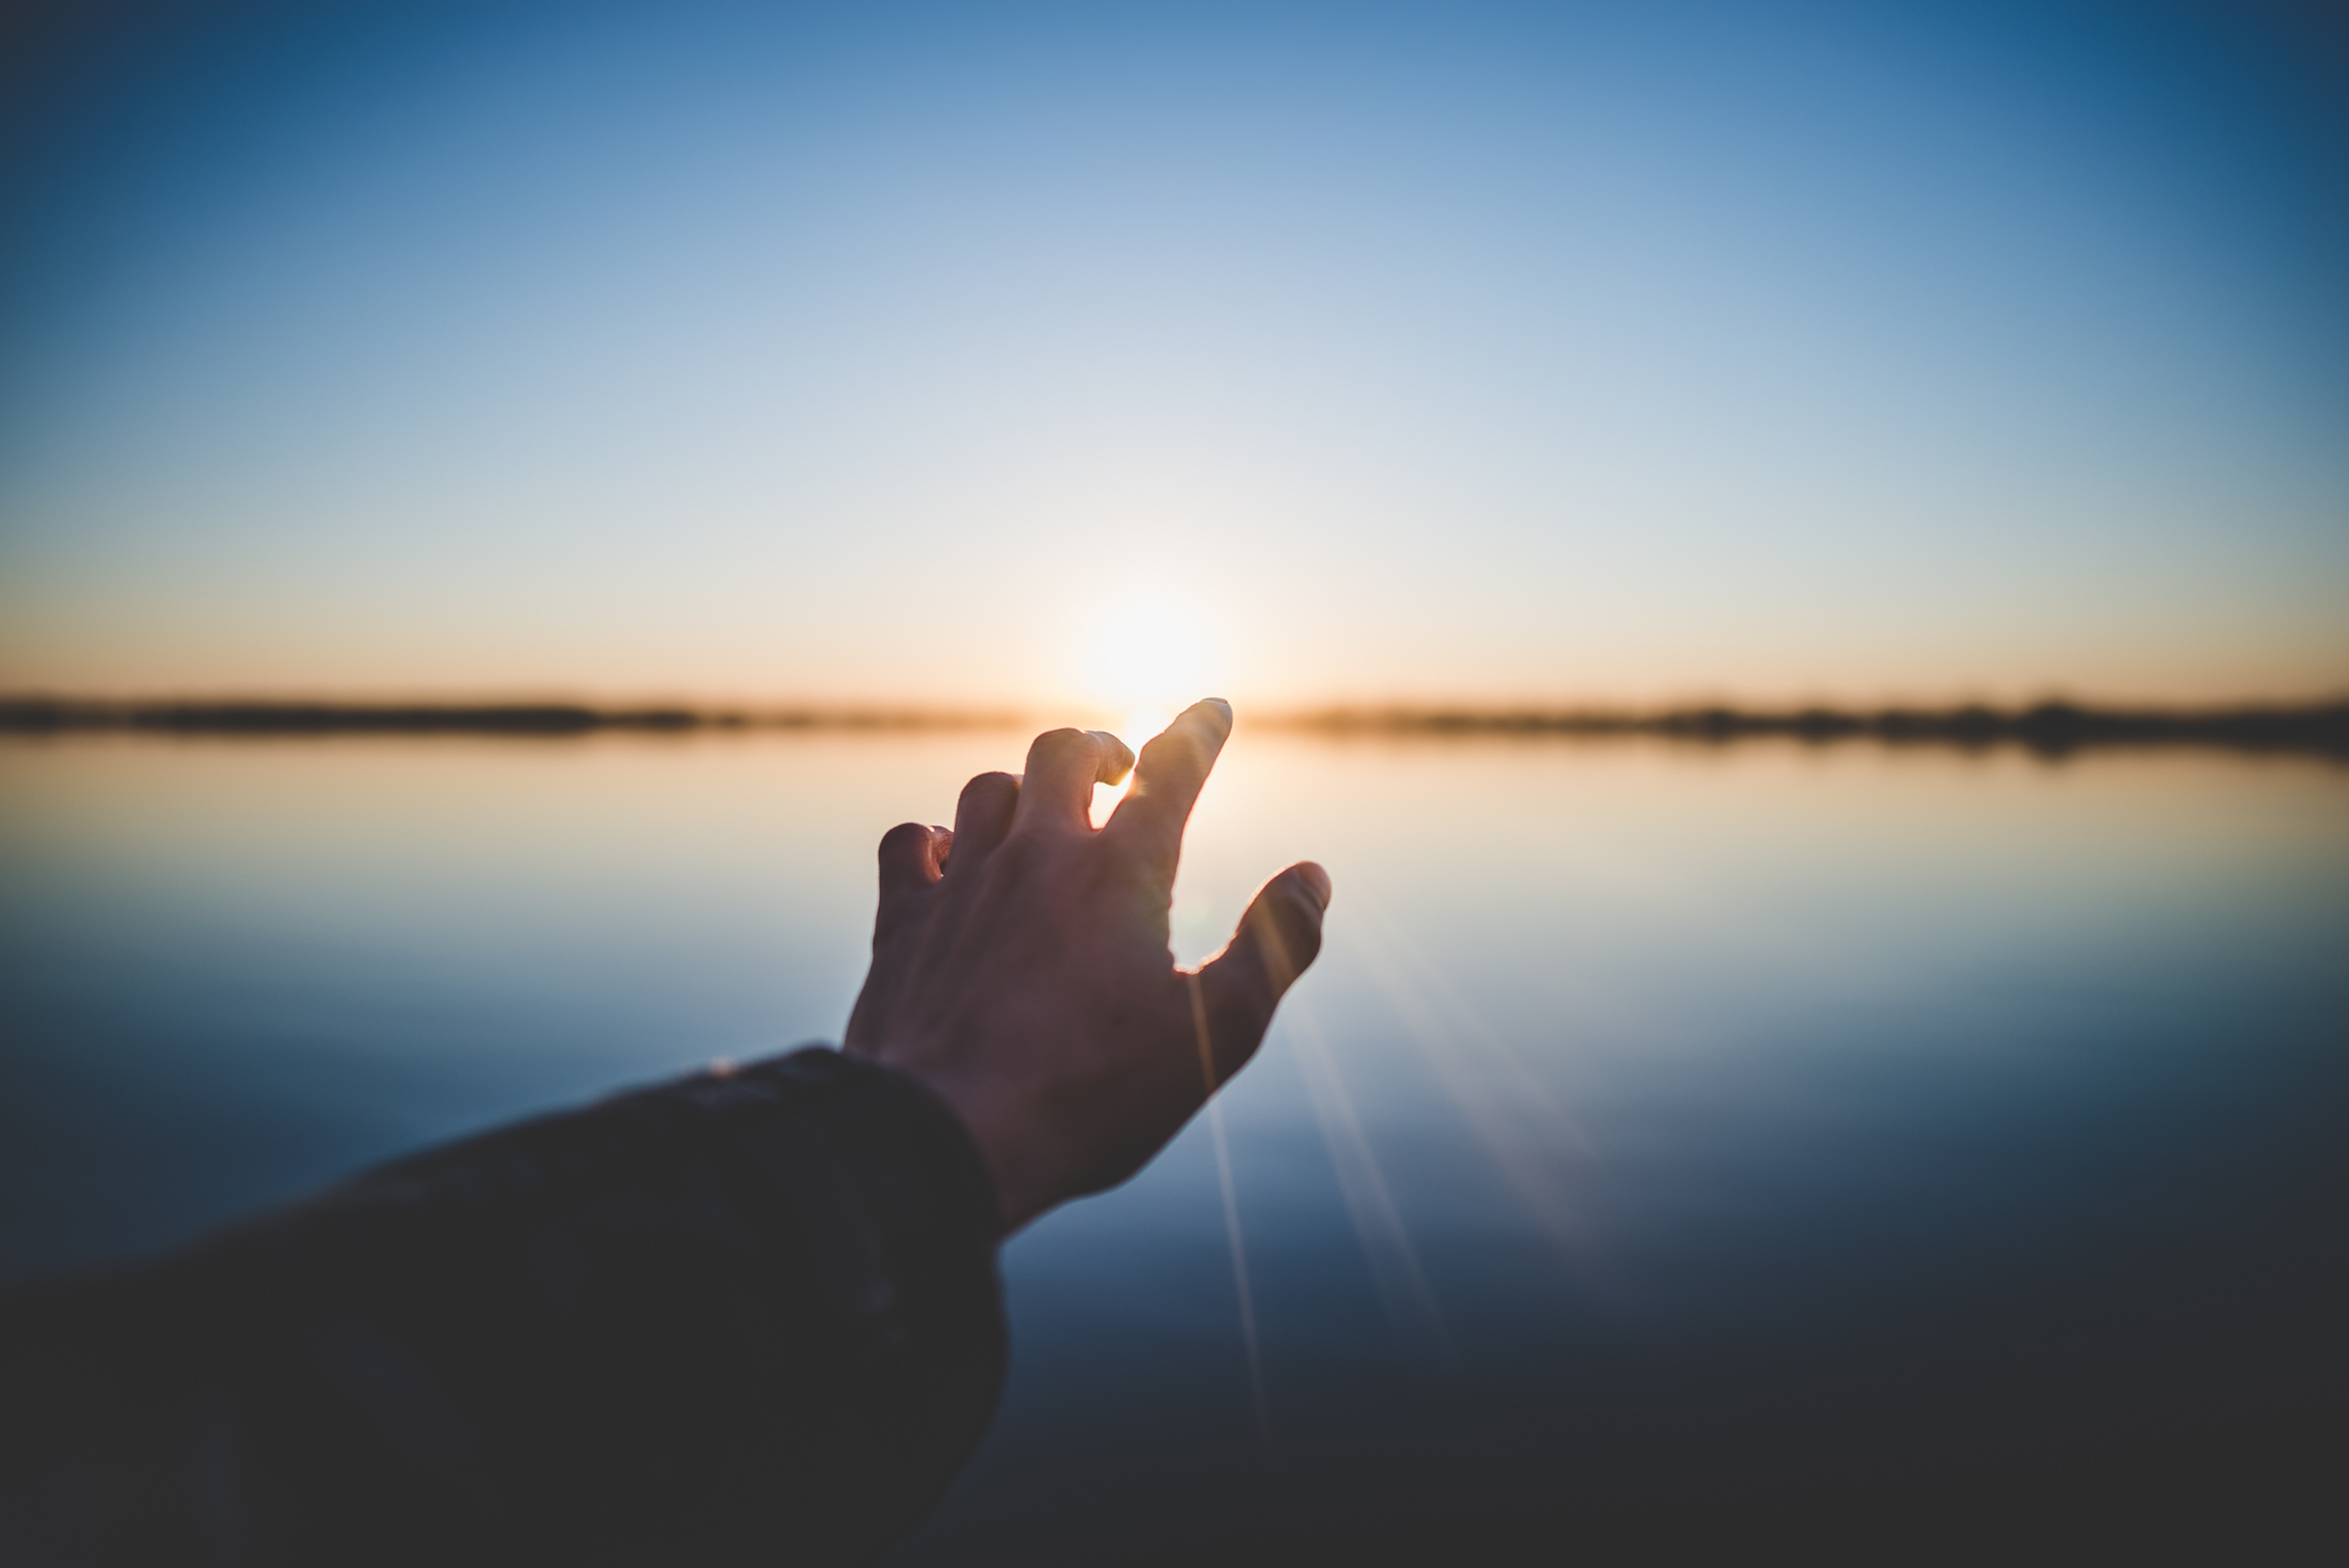 Discovering Peace: Change, Loss & Trauma